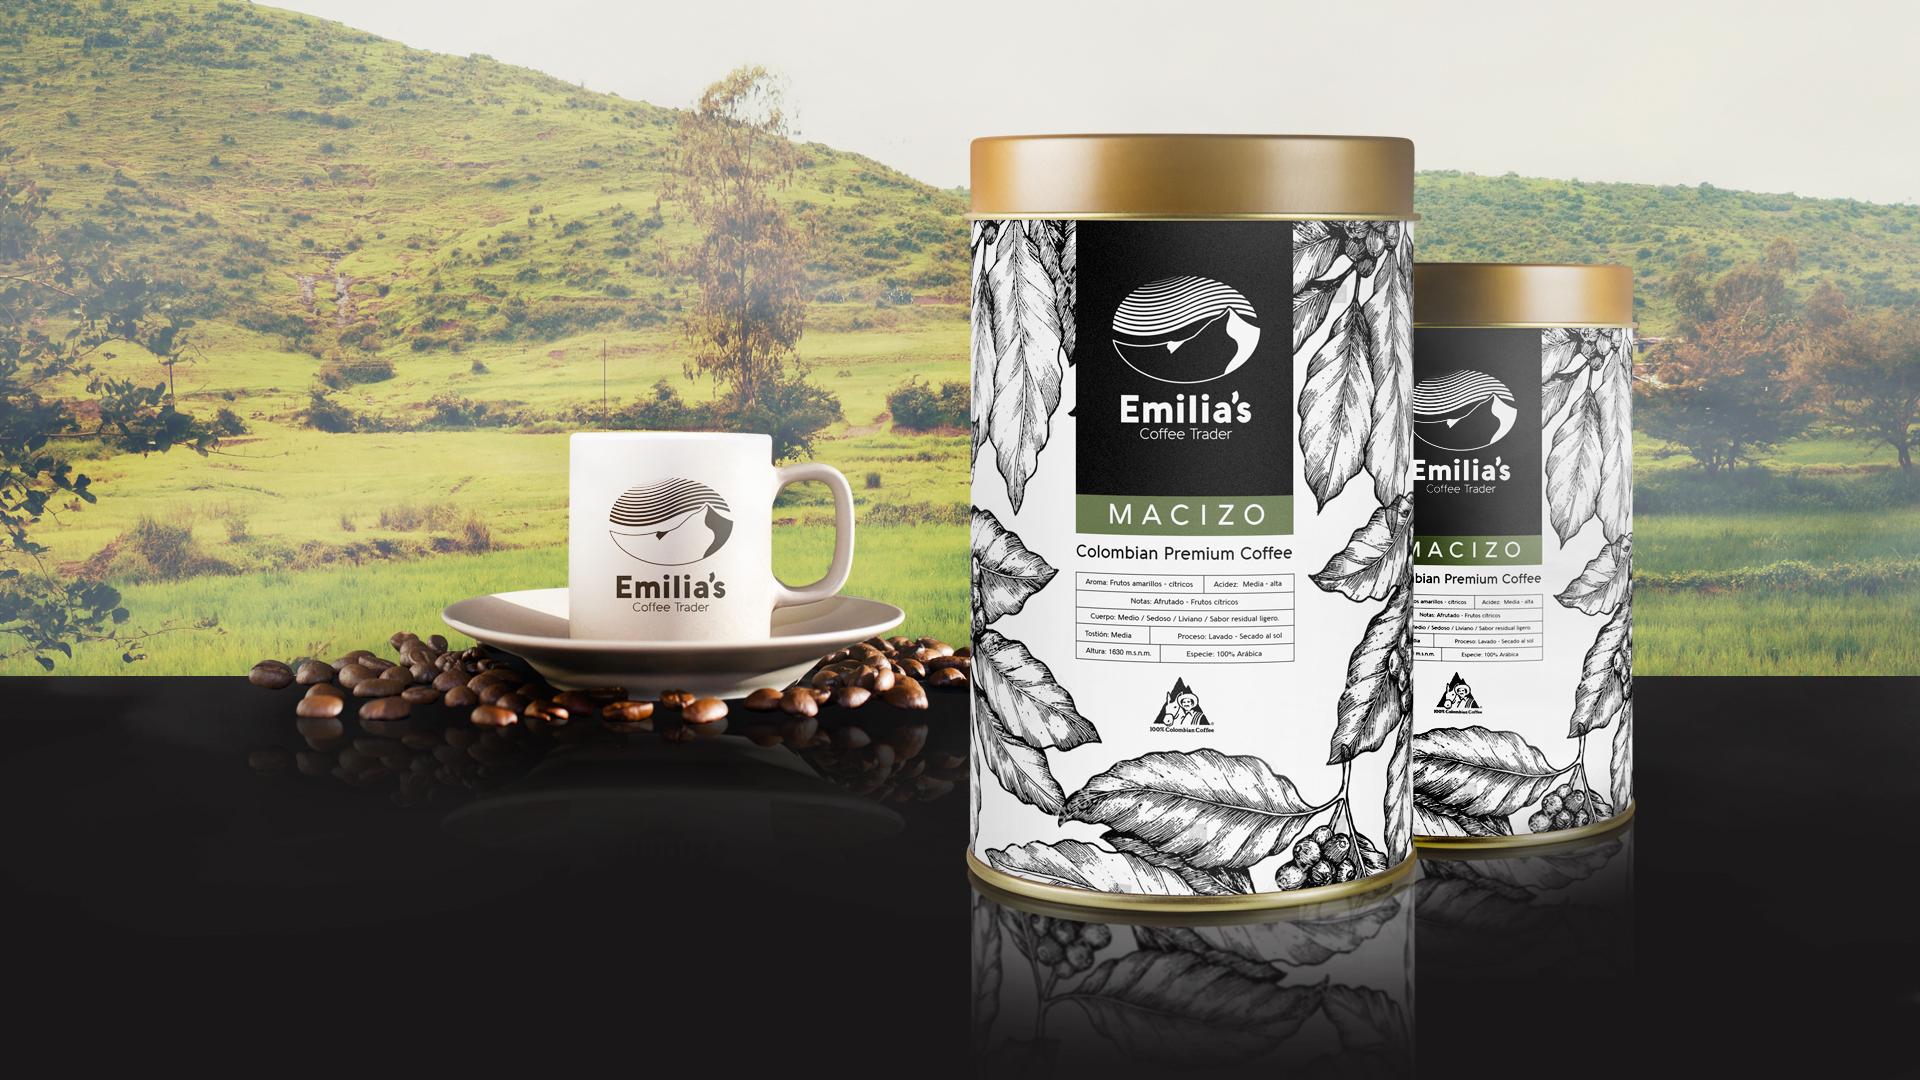 17_09_07_Emilias_Coffee_Trader_Mockup_Empaque_2_1